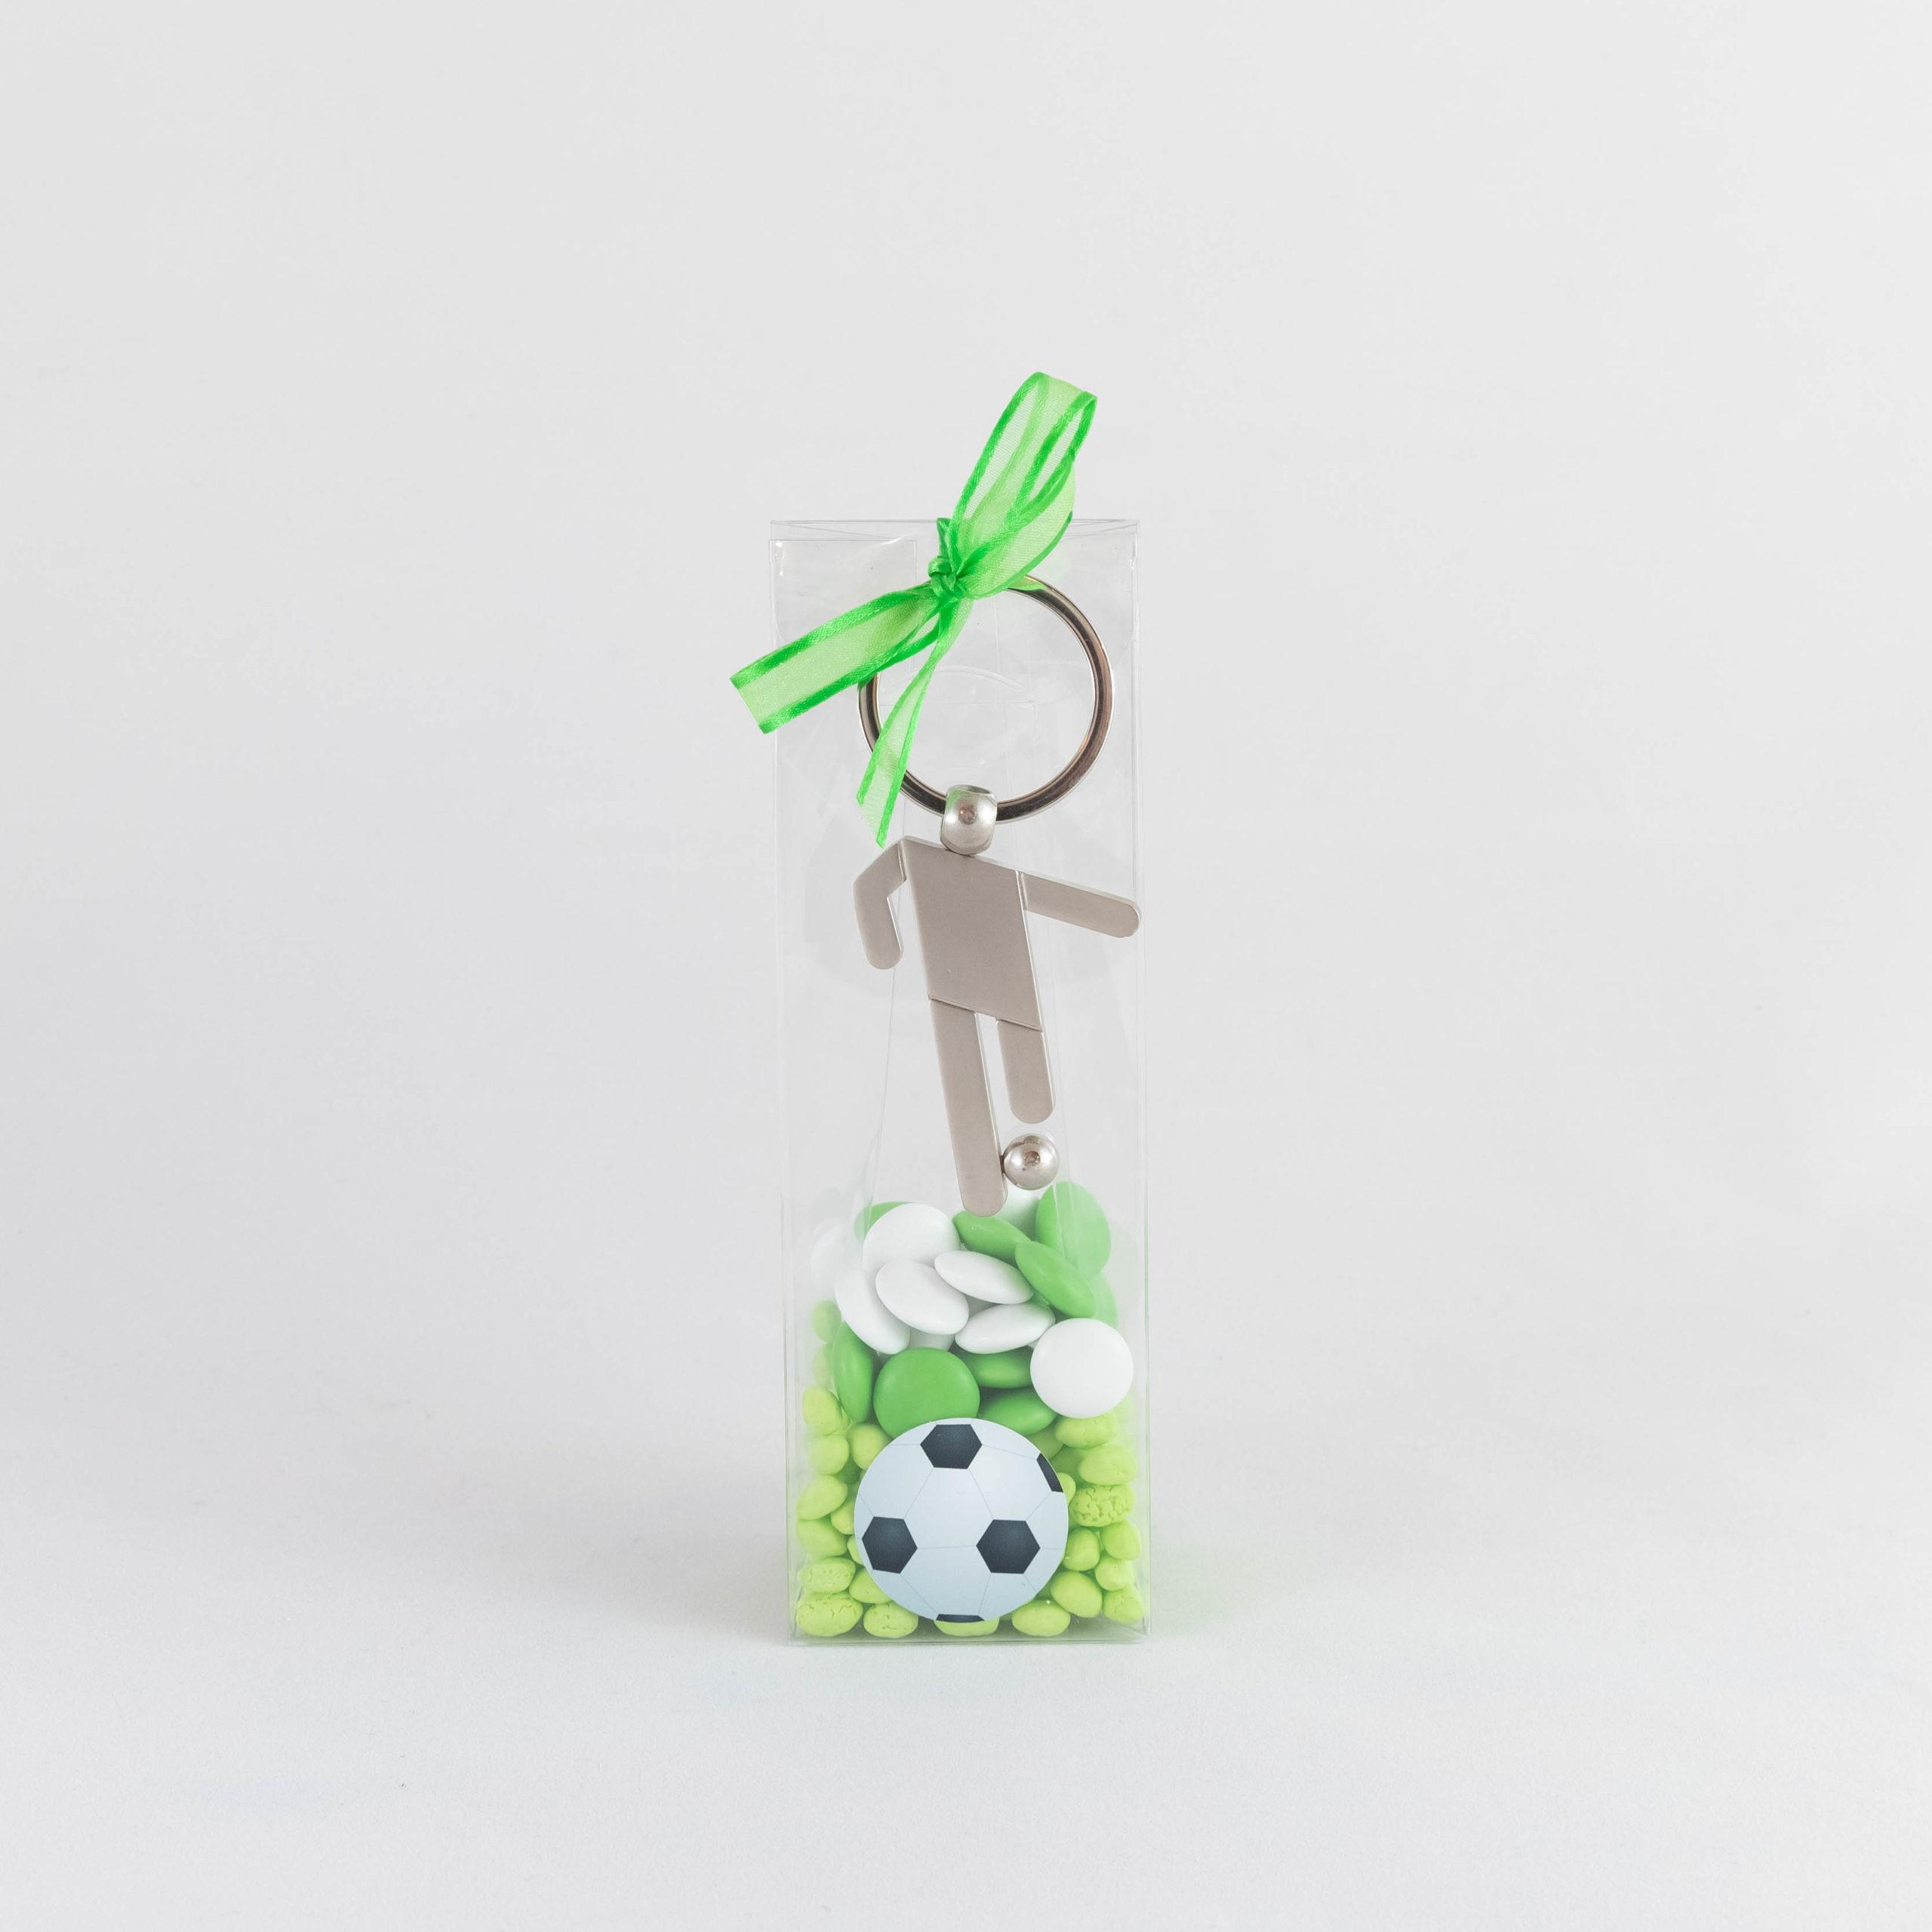 Boite footballeur métal - Foot Image